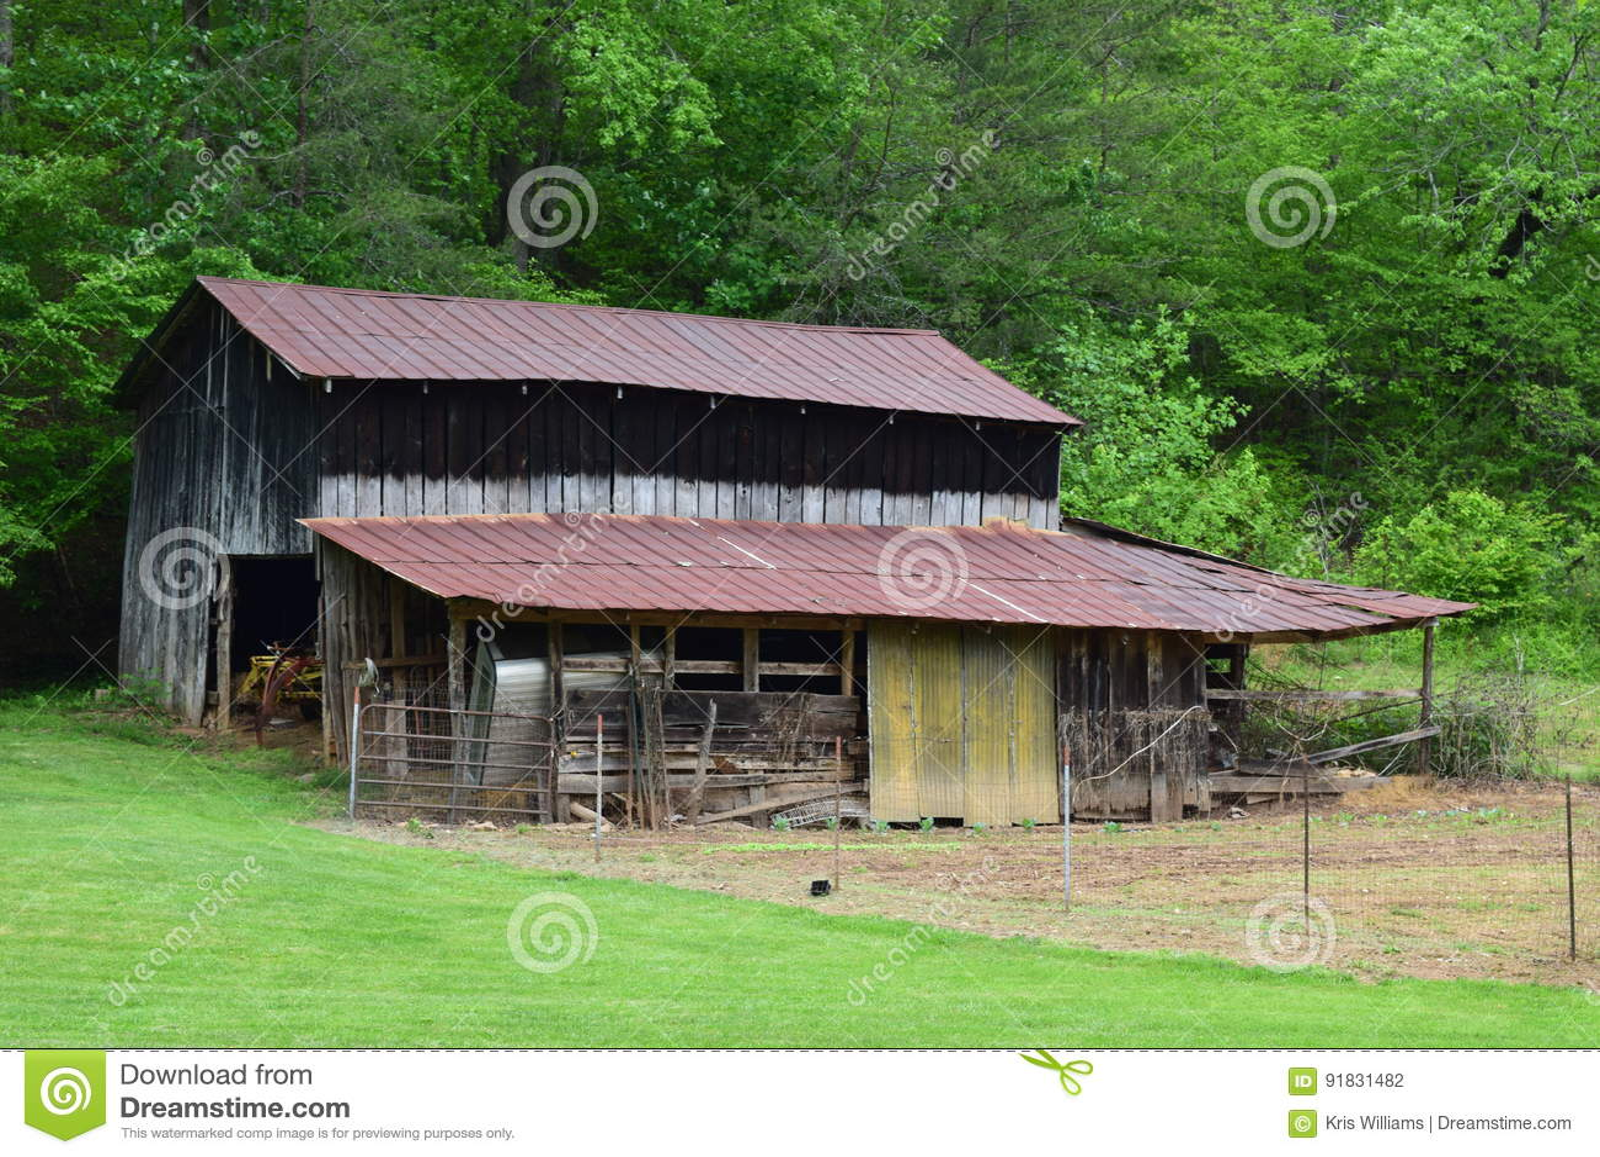 Western NC Mountain Barn and Garden